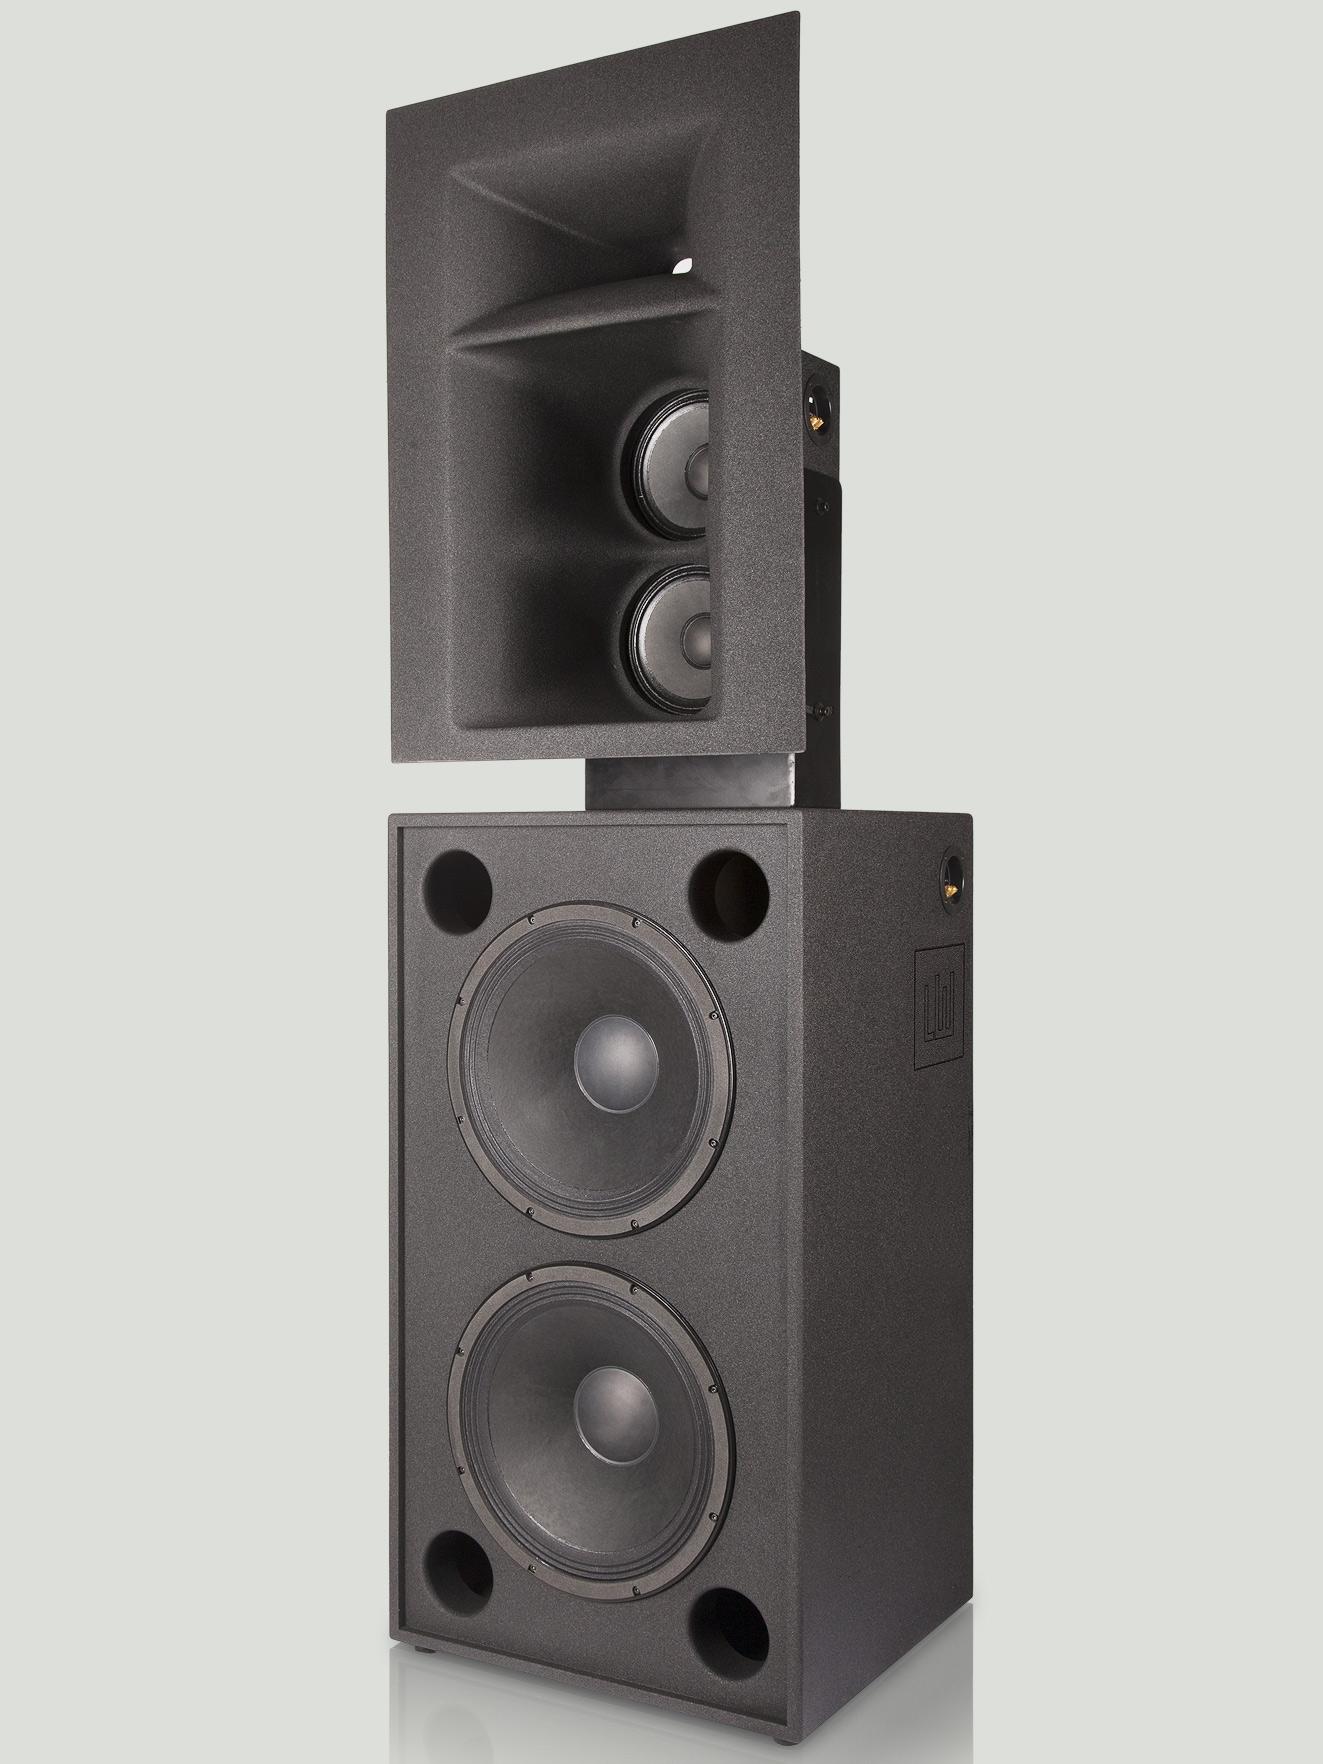 LW 9-BI-TRI 9 WAY COAXIAL - LW Speakers professional cinema